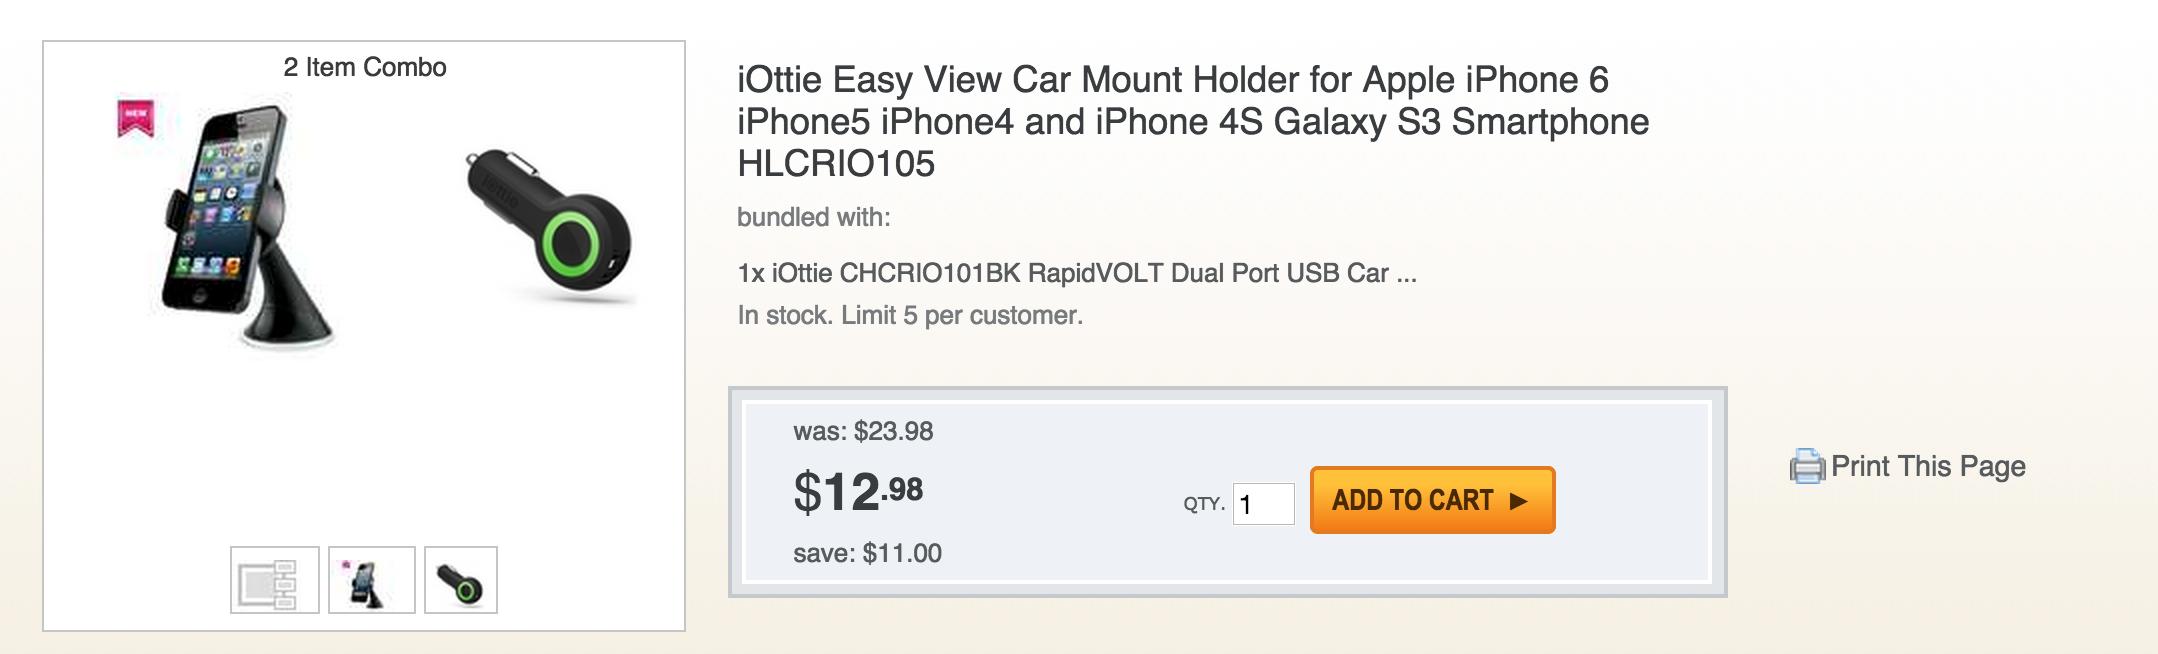 Iottie Easy View Iphone 6 Car Mount Rapidvolt Dual Usb